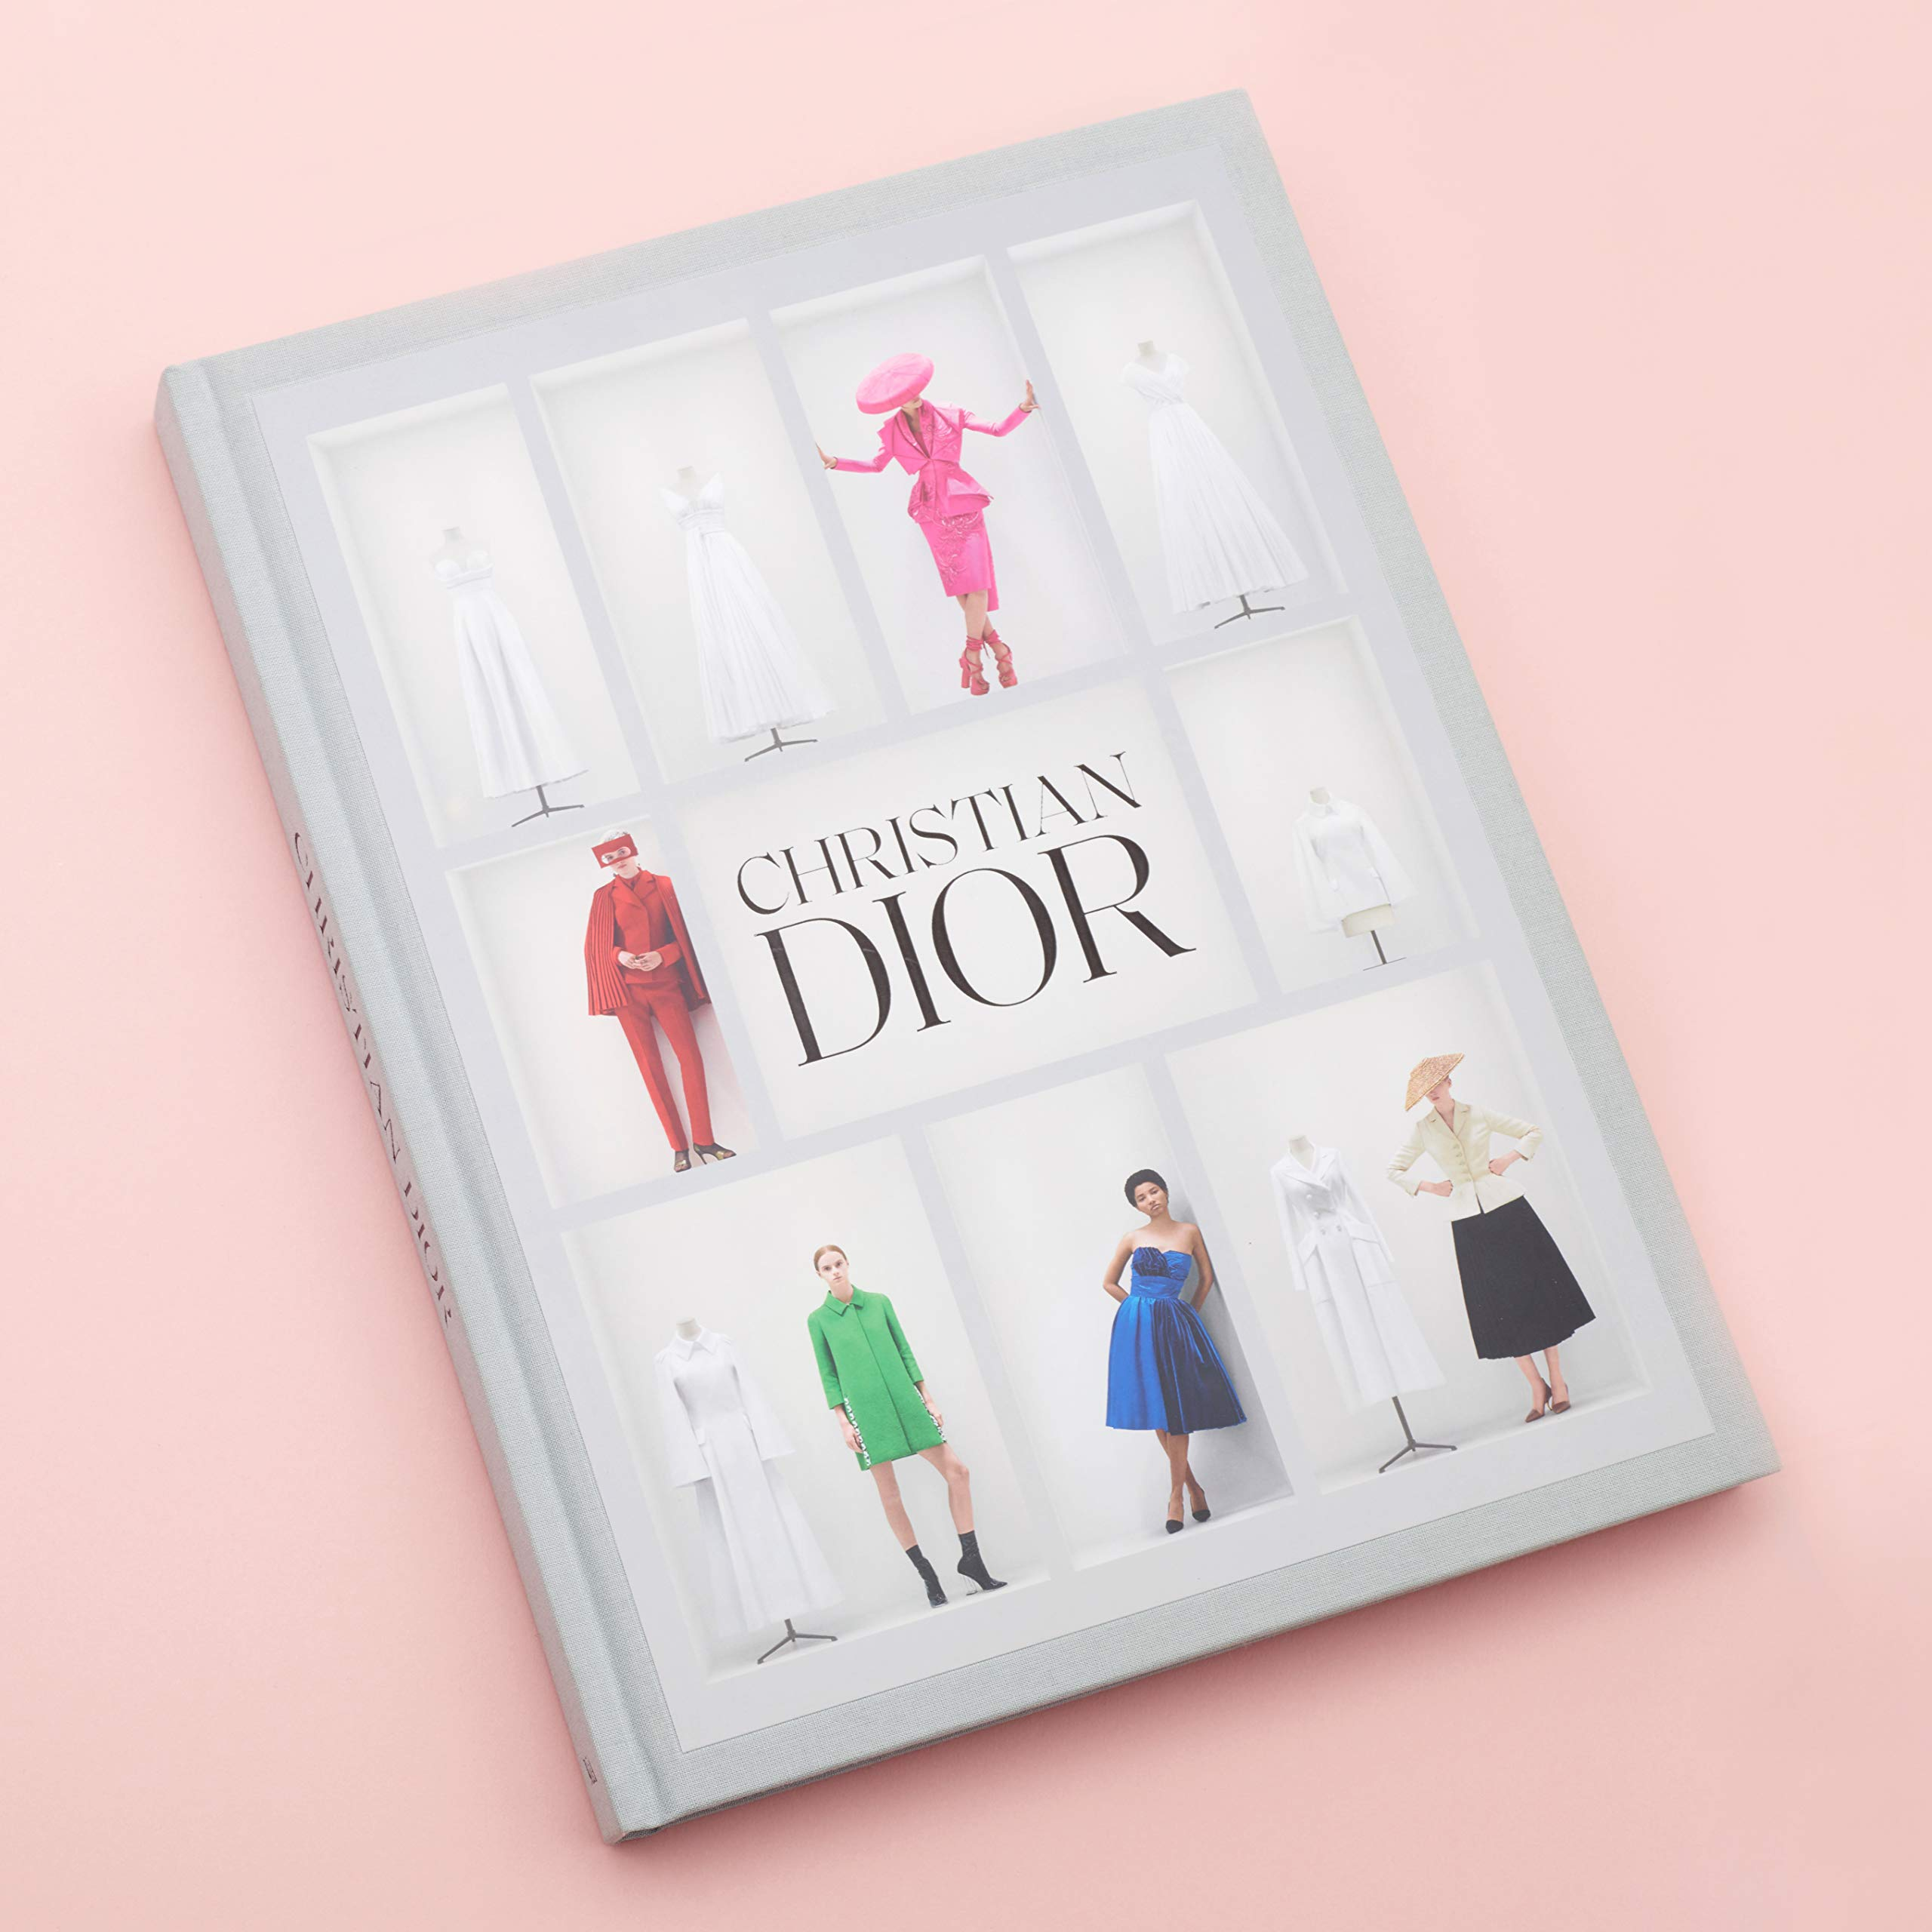 a766d29b9fbe Christian Dior  Amazon.co.uk  Oriole Cullen